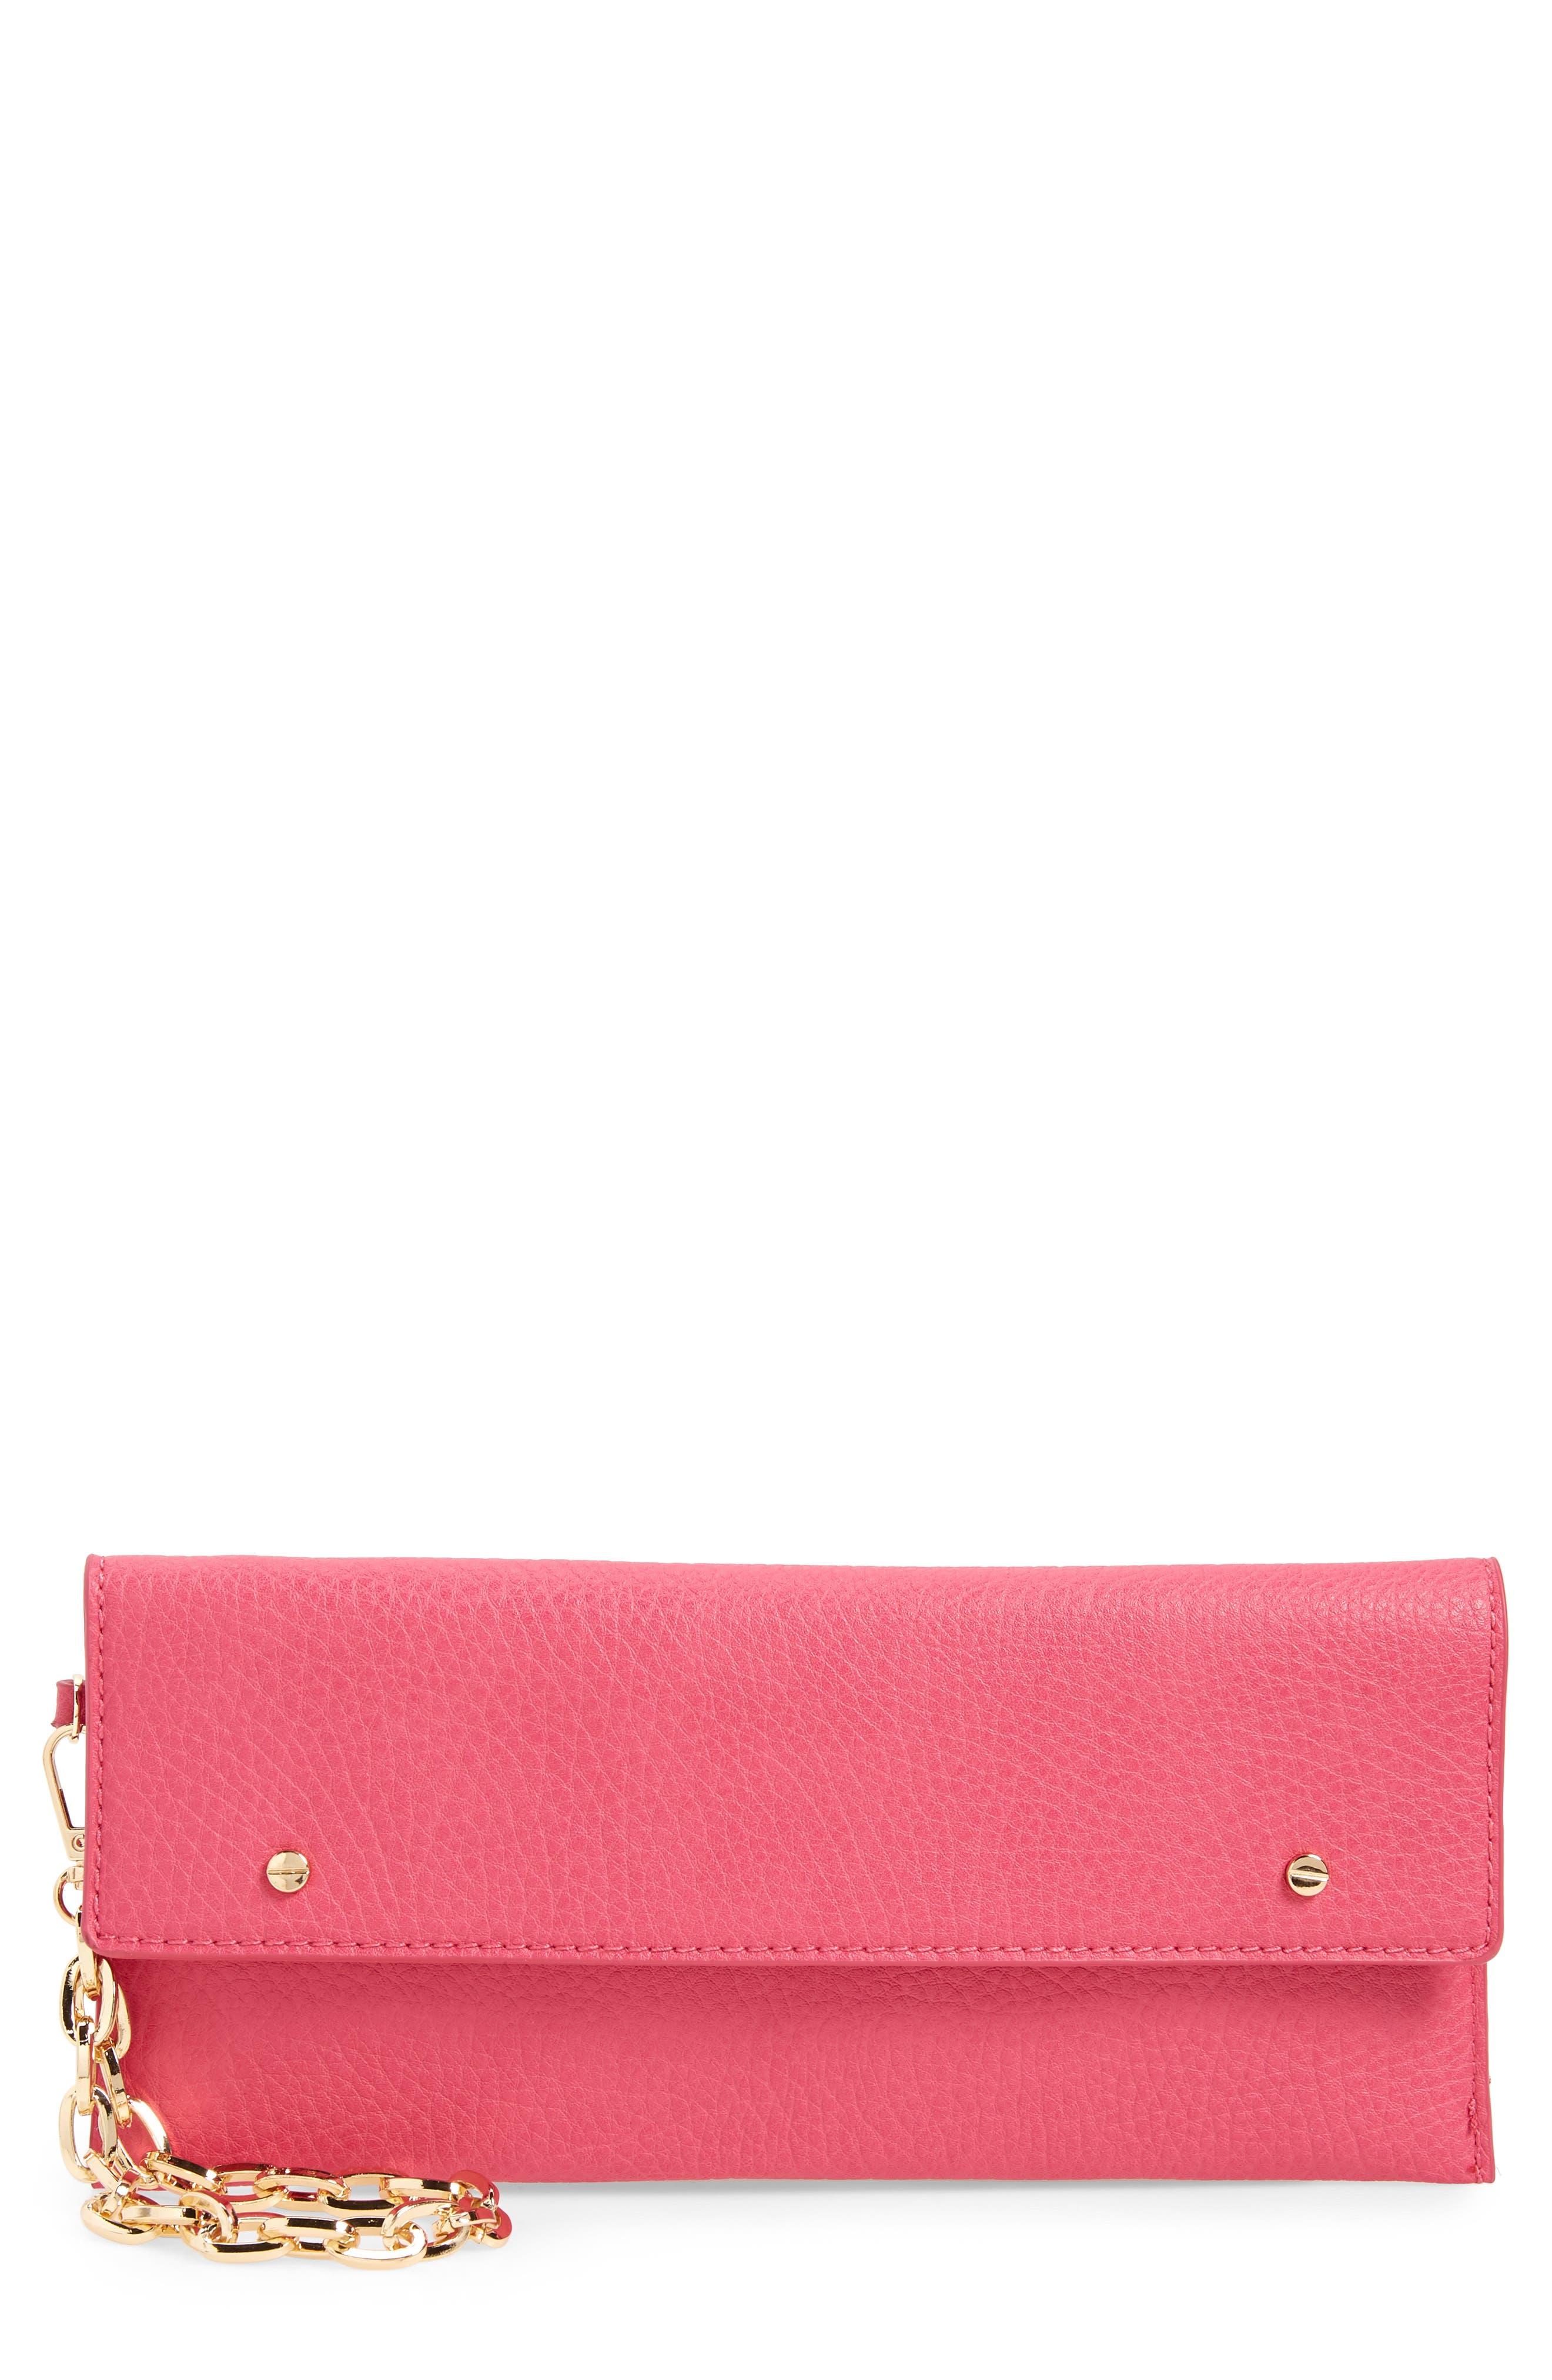 Mali + Lili April Vegan Leather Wristlet - Pink